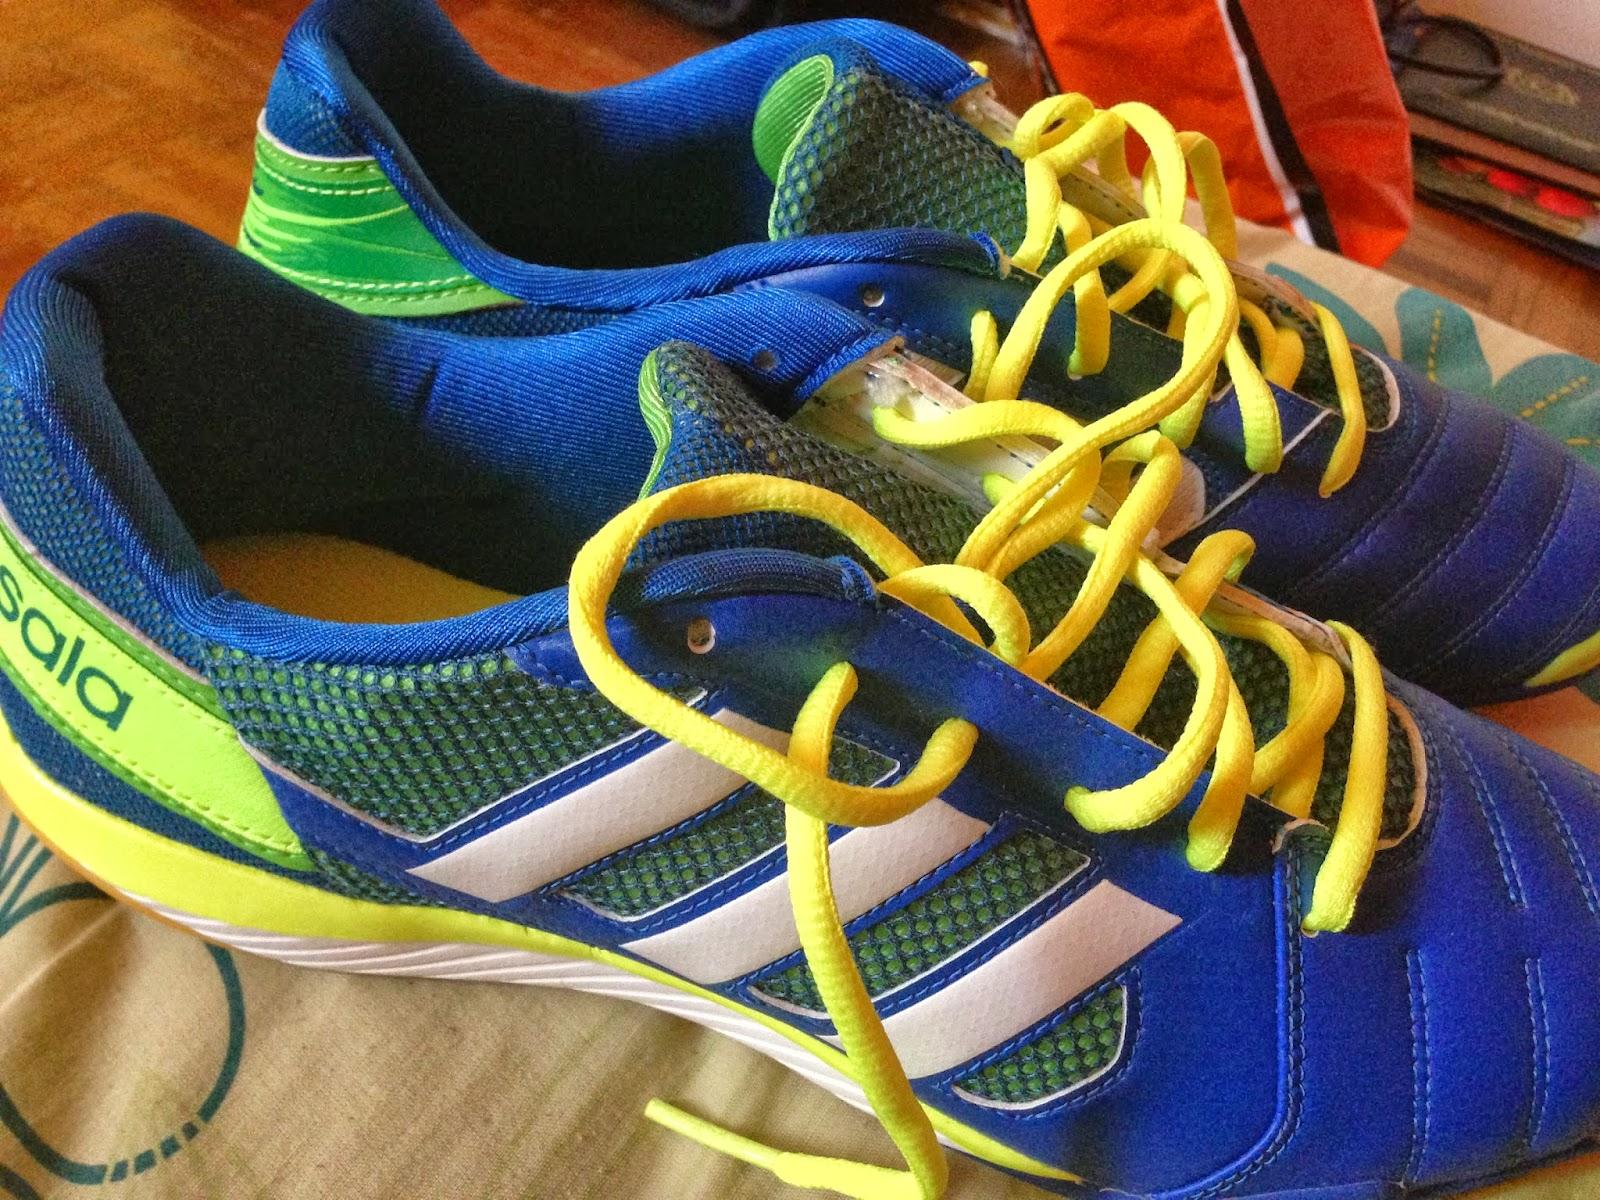 eaba907095020 ... australia adidas freefootball top sala indoor soccer shoes blue beauty  66ca7 da47d coupon code adidas ff top sala lime indoor soccer futsal ...